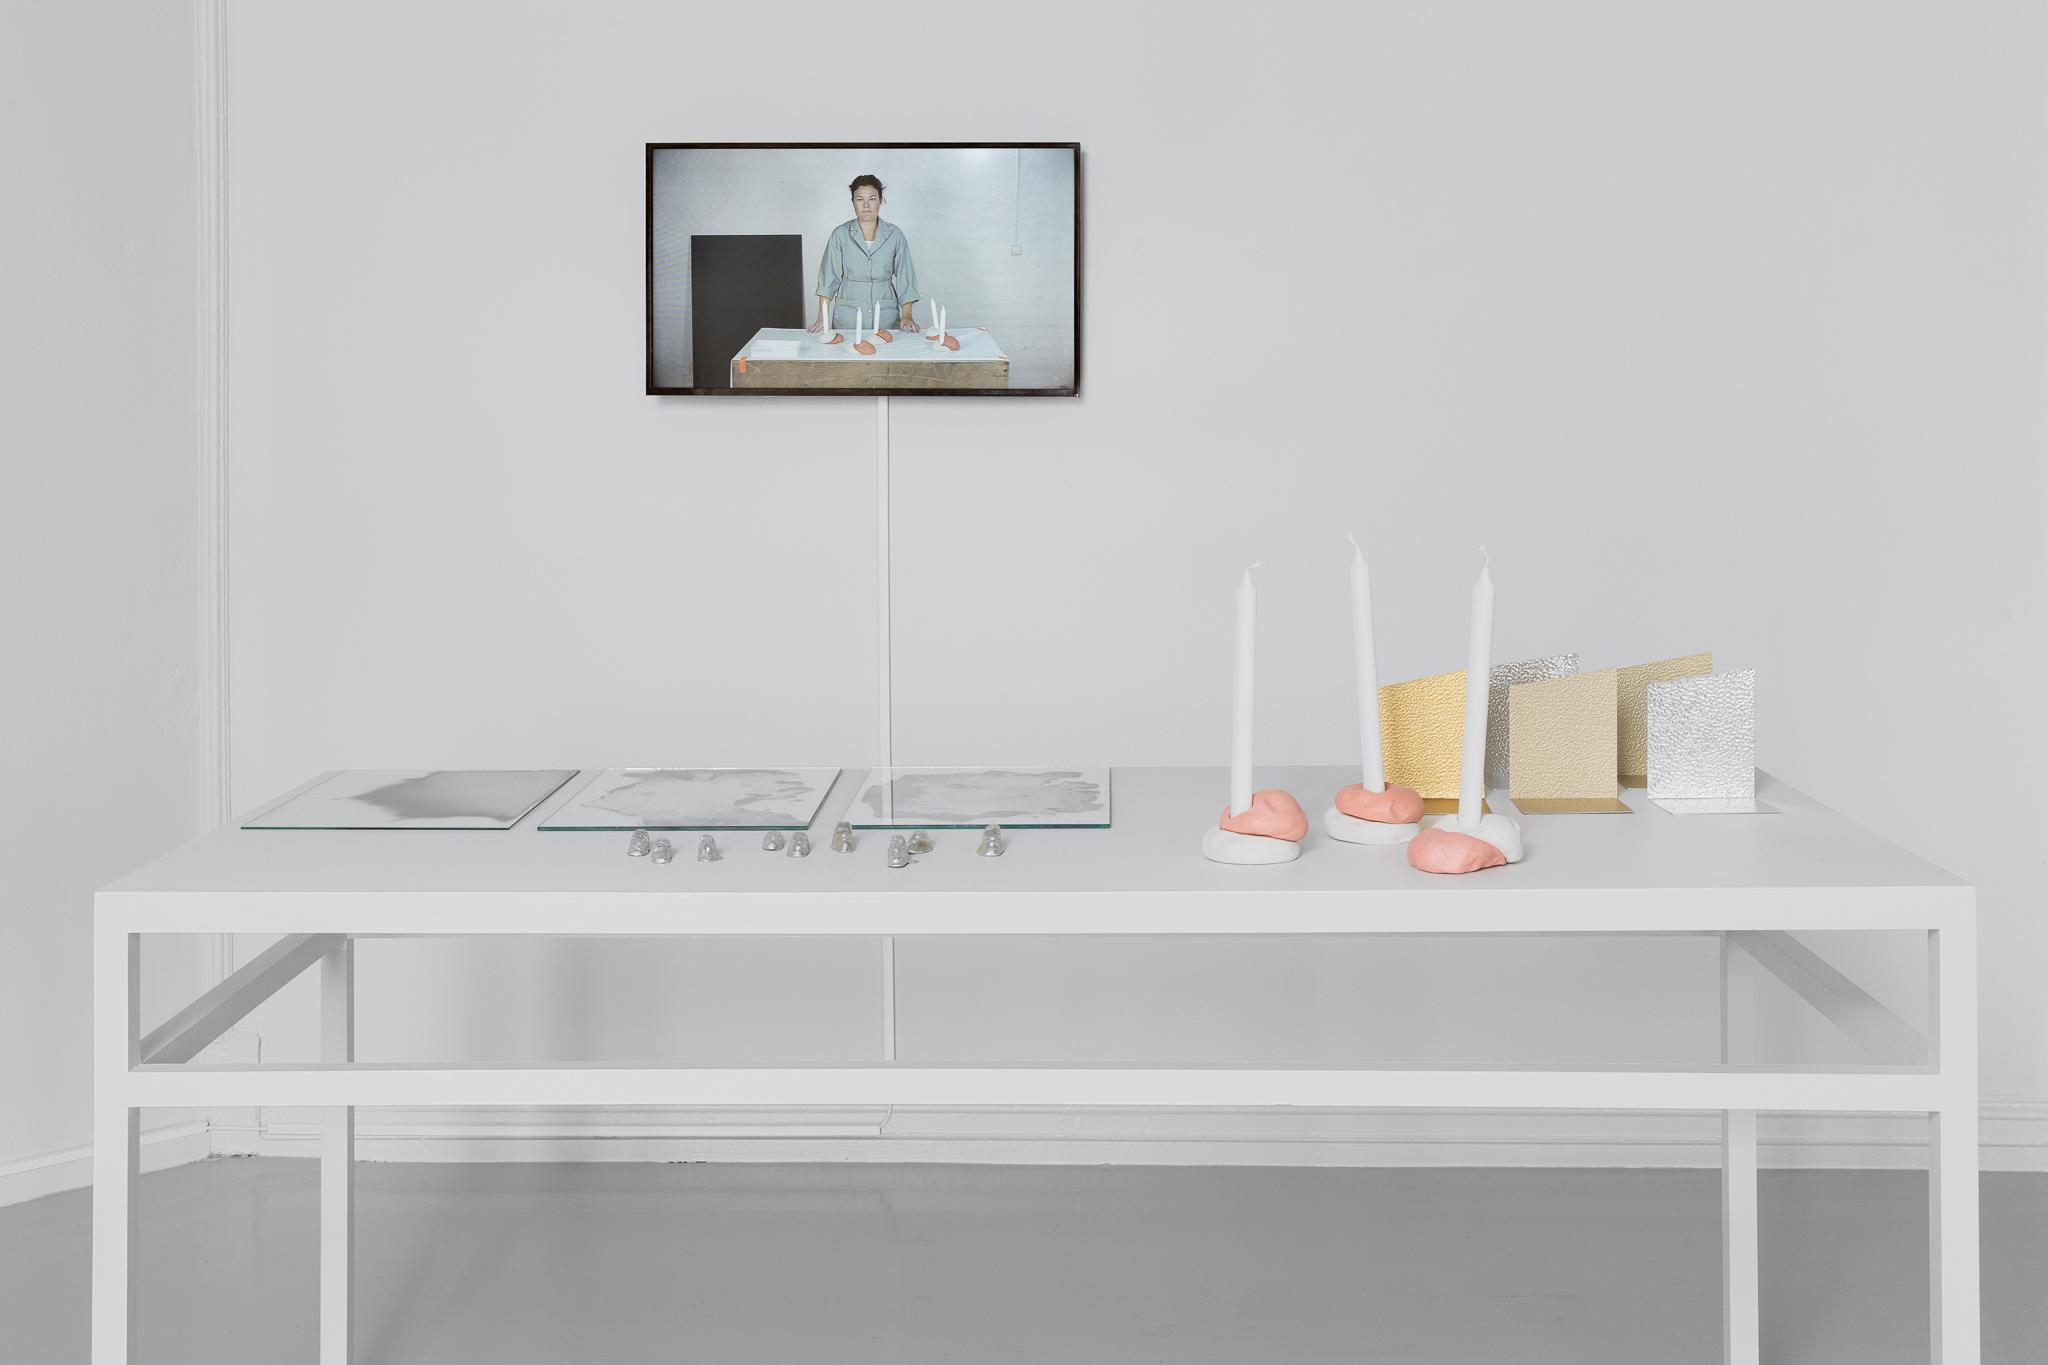 Jenny Nordberg ,   3 to 5 seconds: Rapid Handmade Production , 2014. Video og objekter. Foto: Istvan Virag